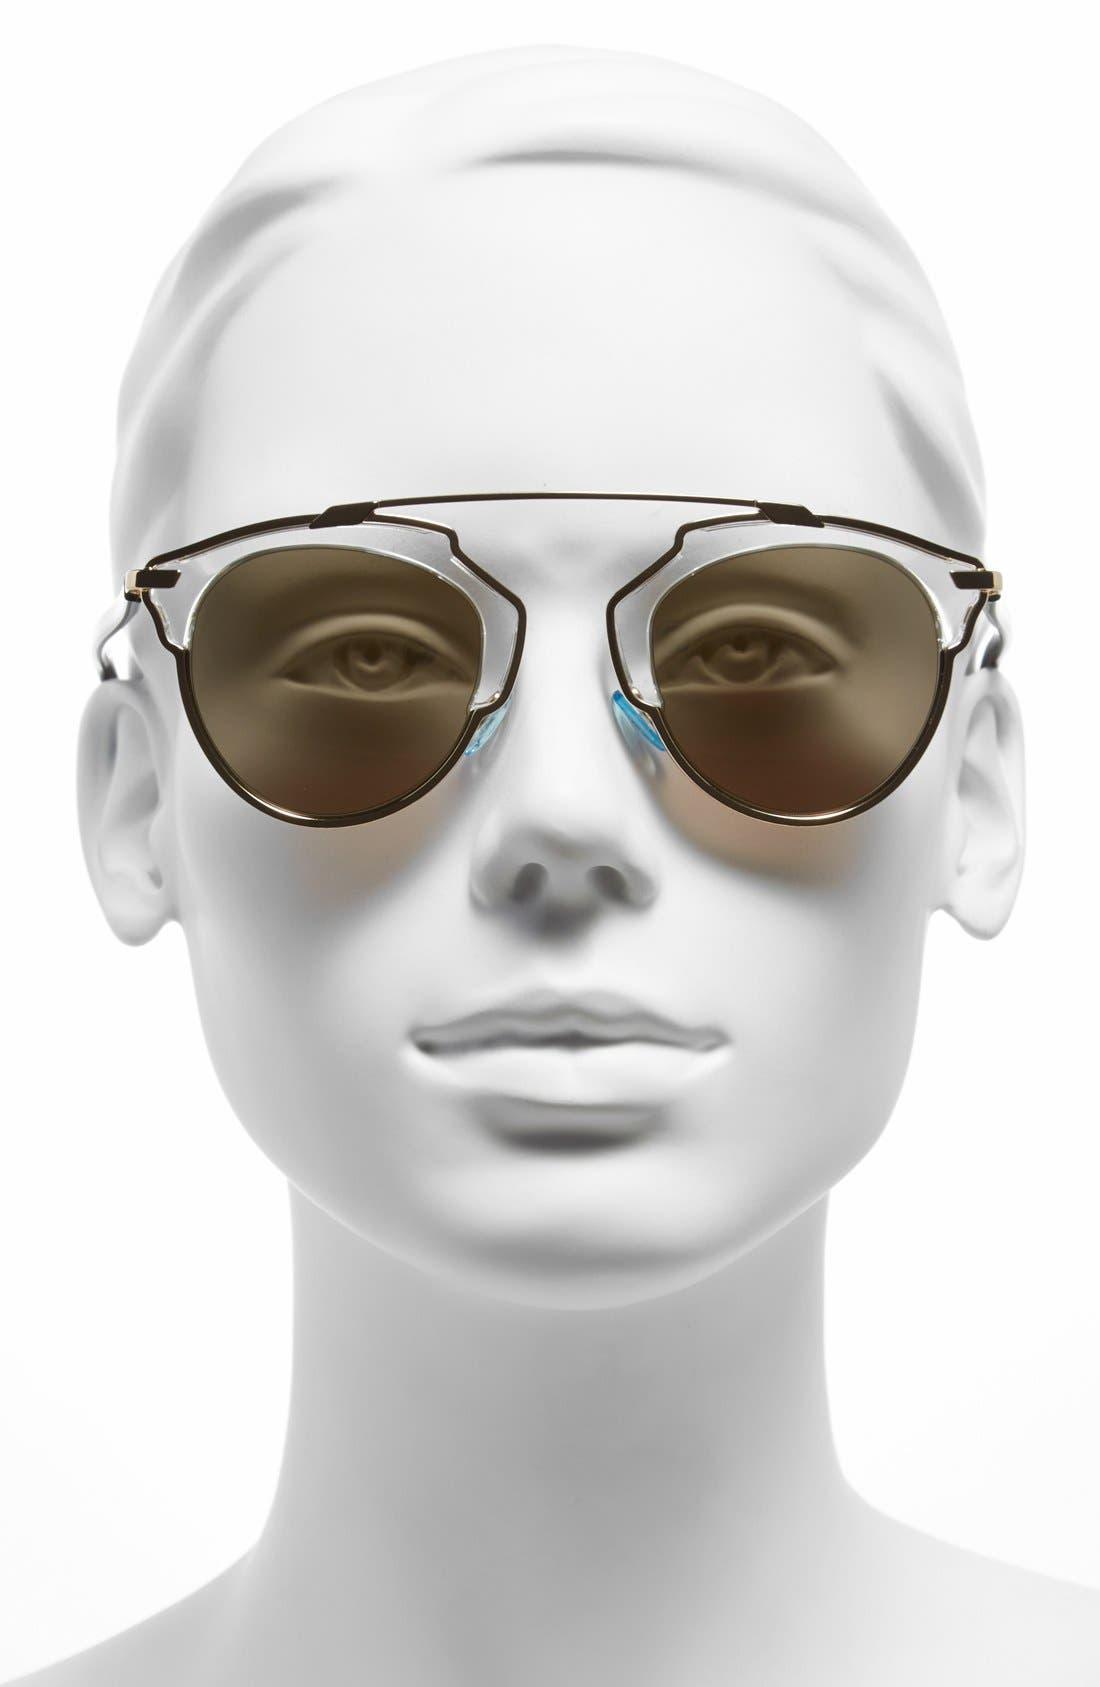 So Real 48mm Brow Bar Sunglasses,                             Alternate thumbnail 48, color,